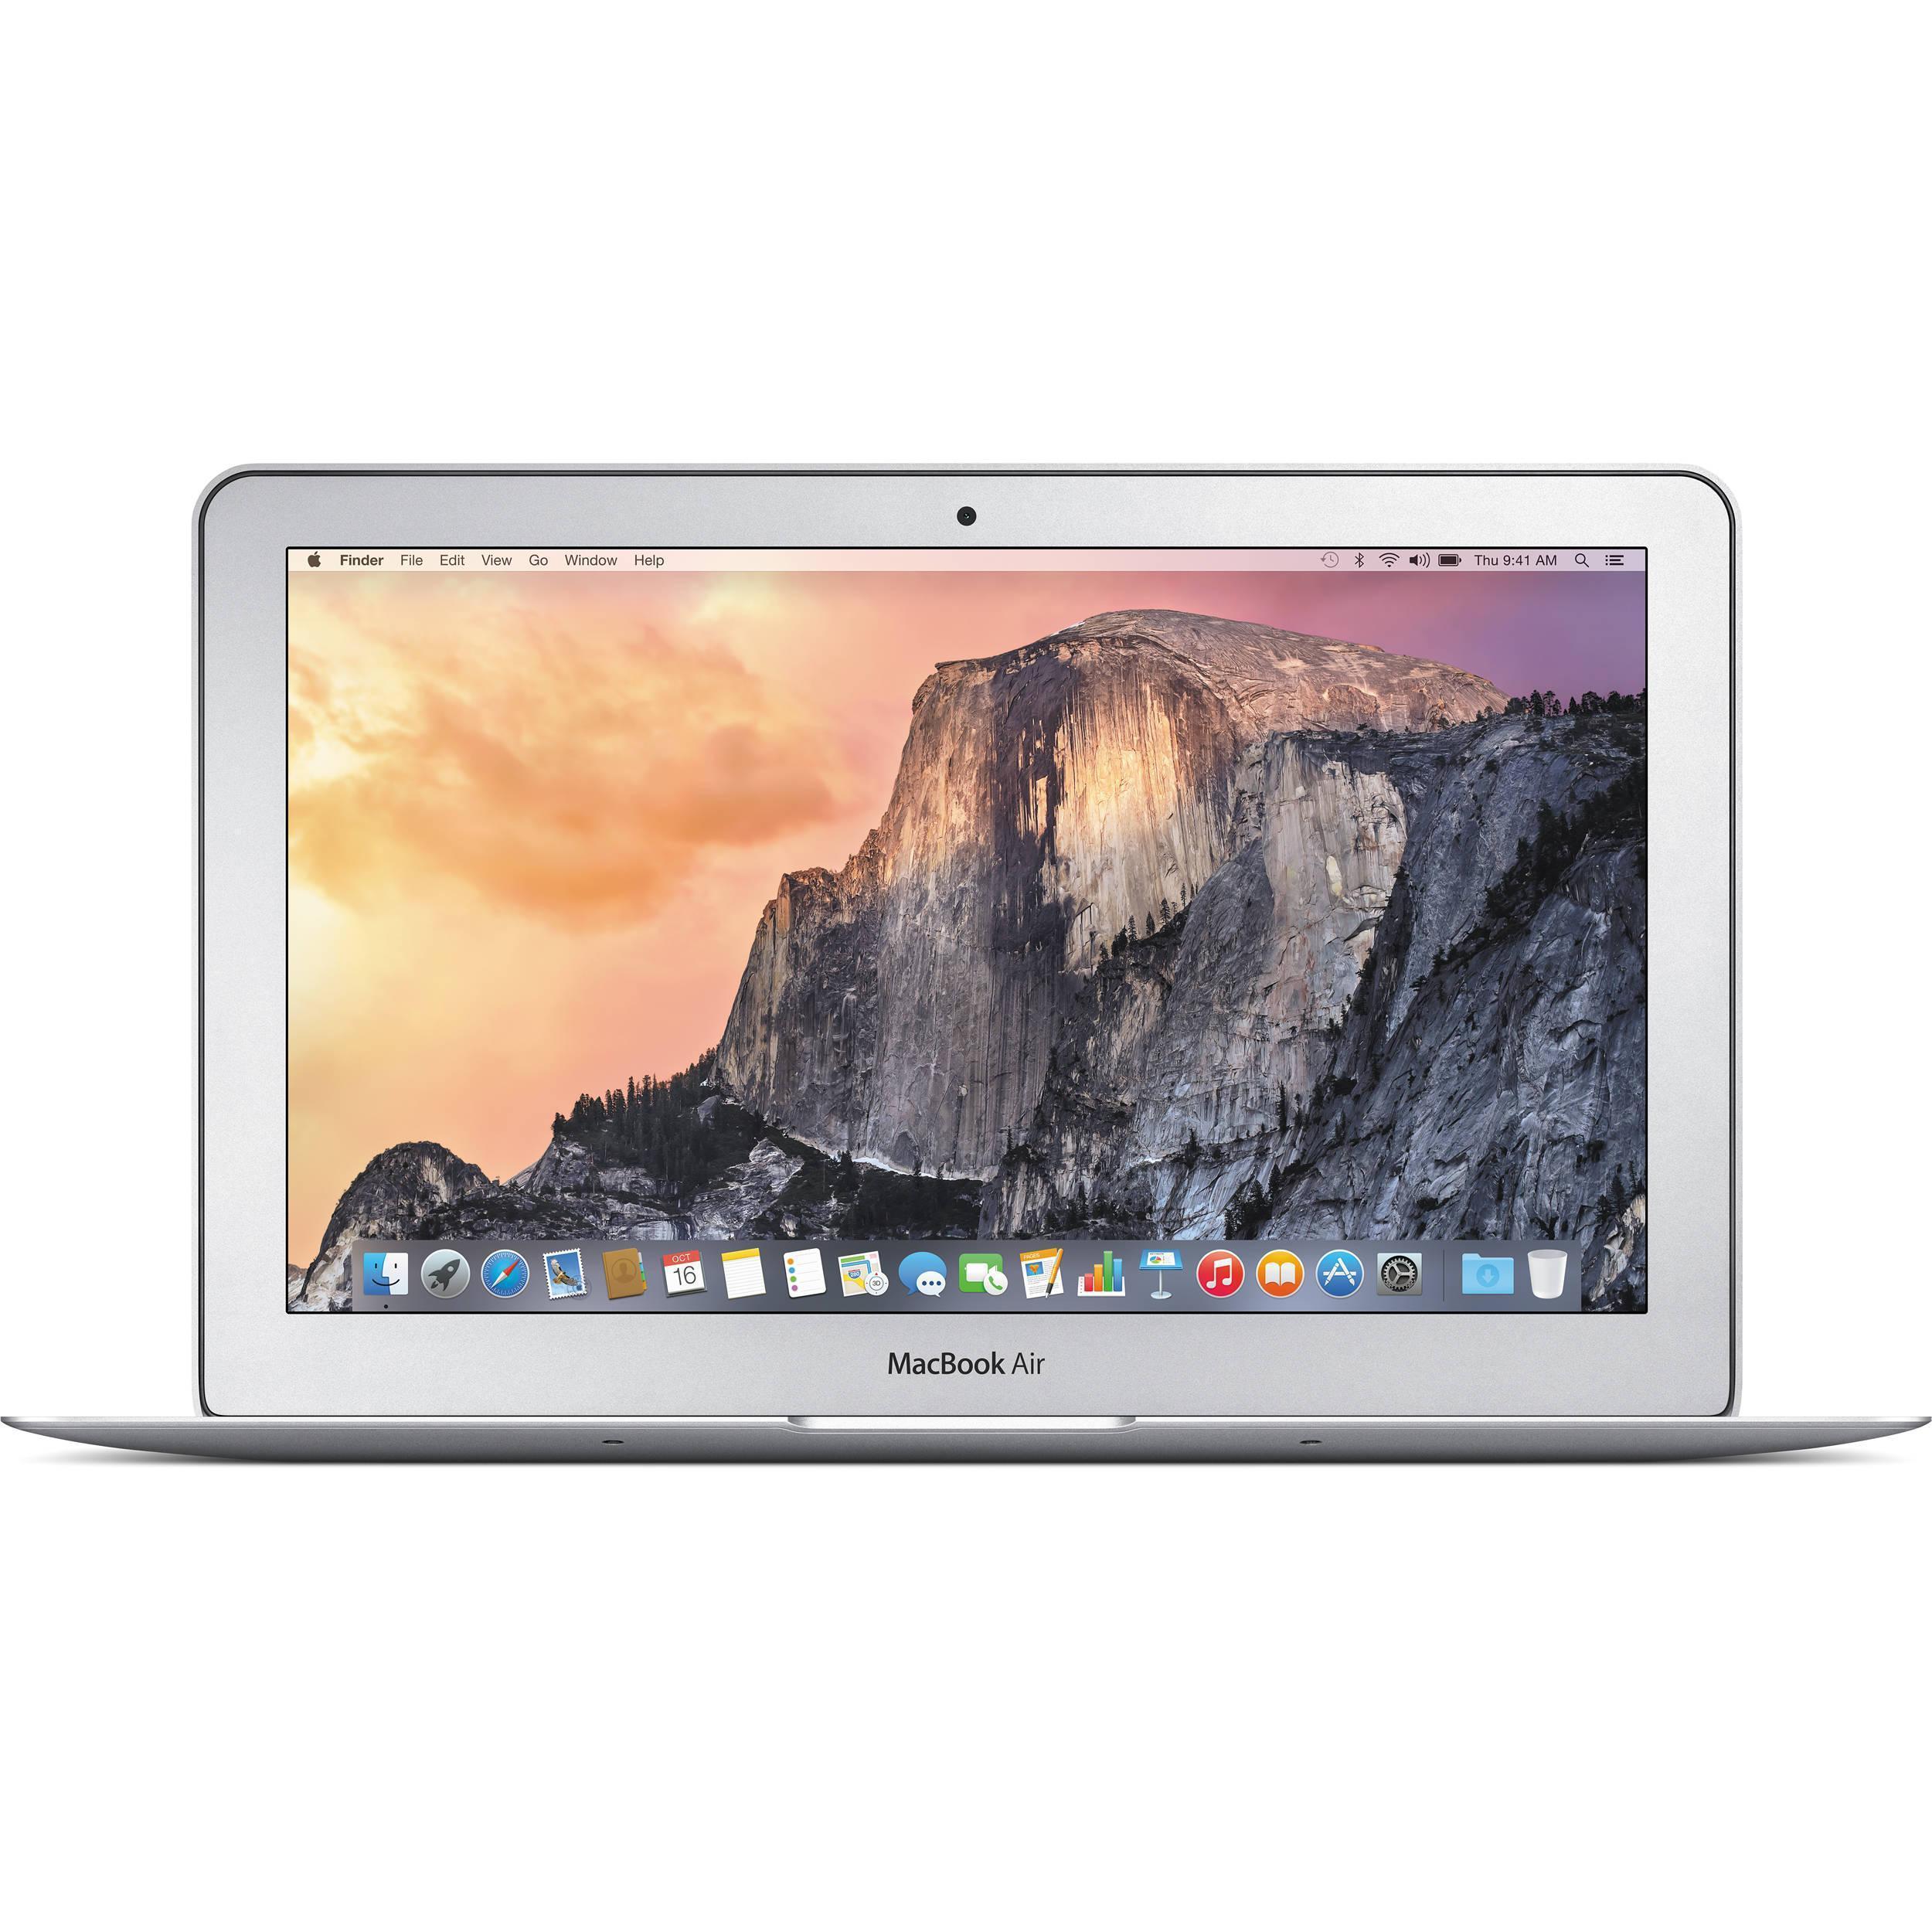 "MacBook Air 11"" (2011) - Core i5 1,6 GHz - SSD 128 GB - 4GB - AZERTY - Frans"